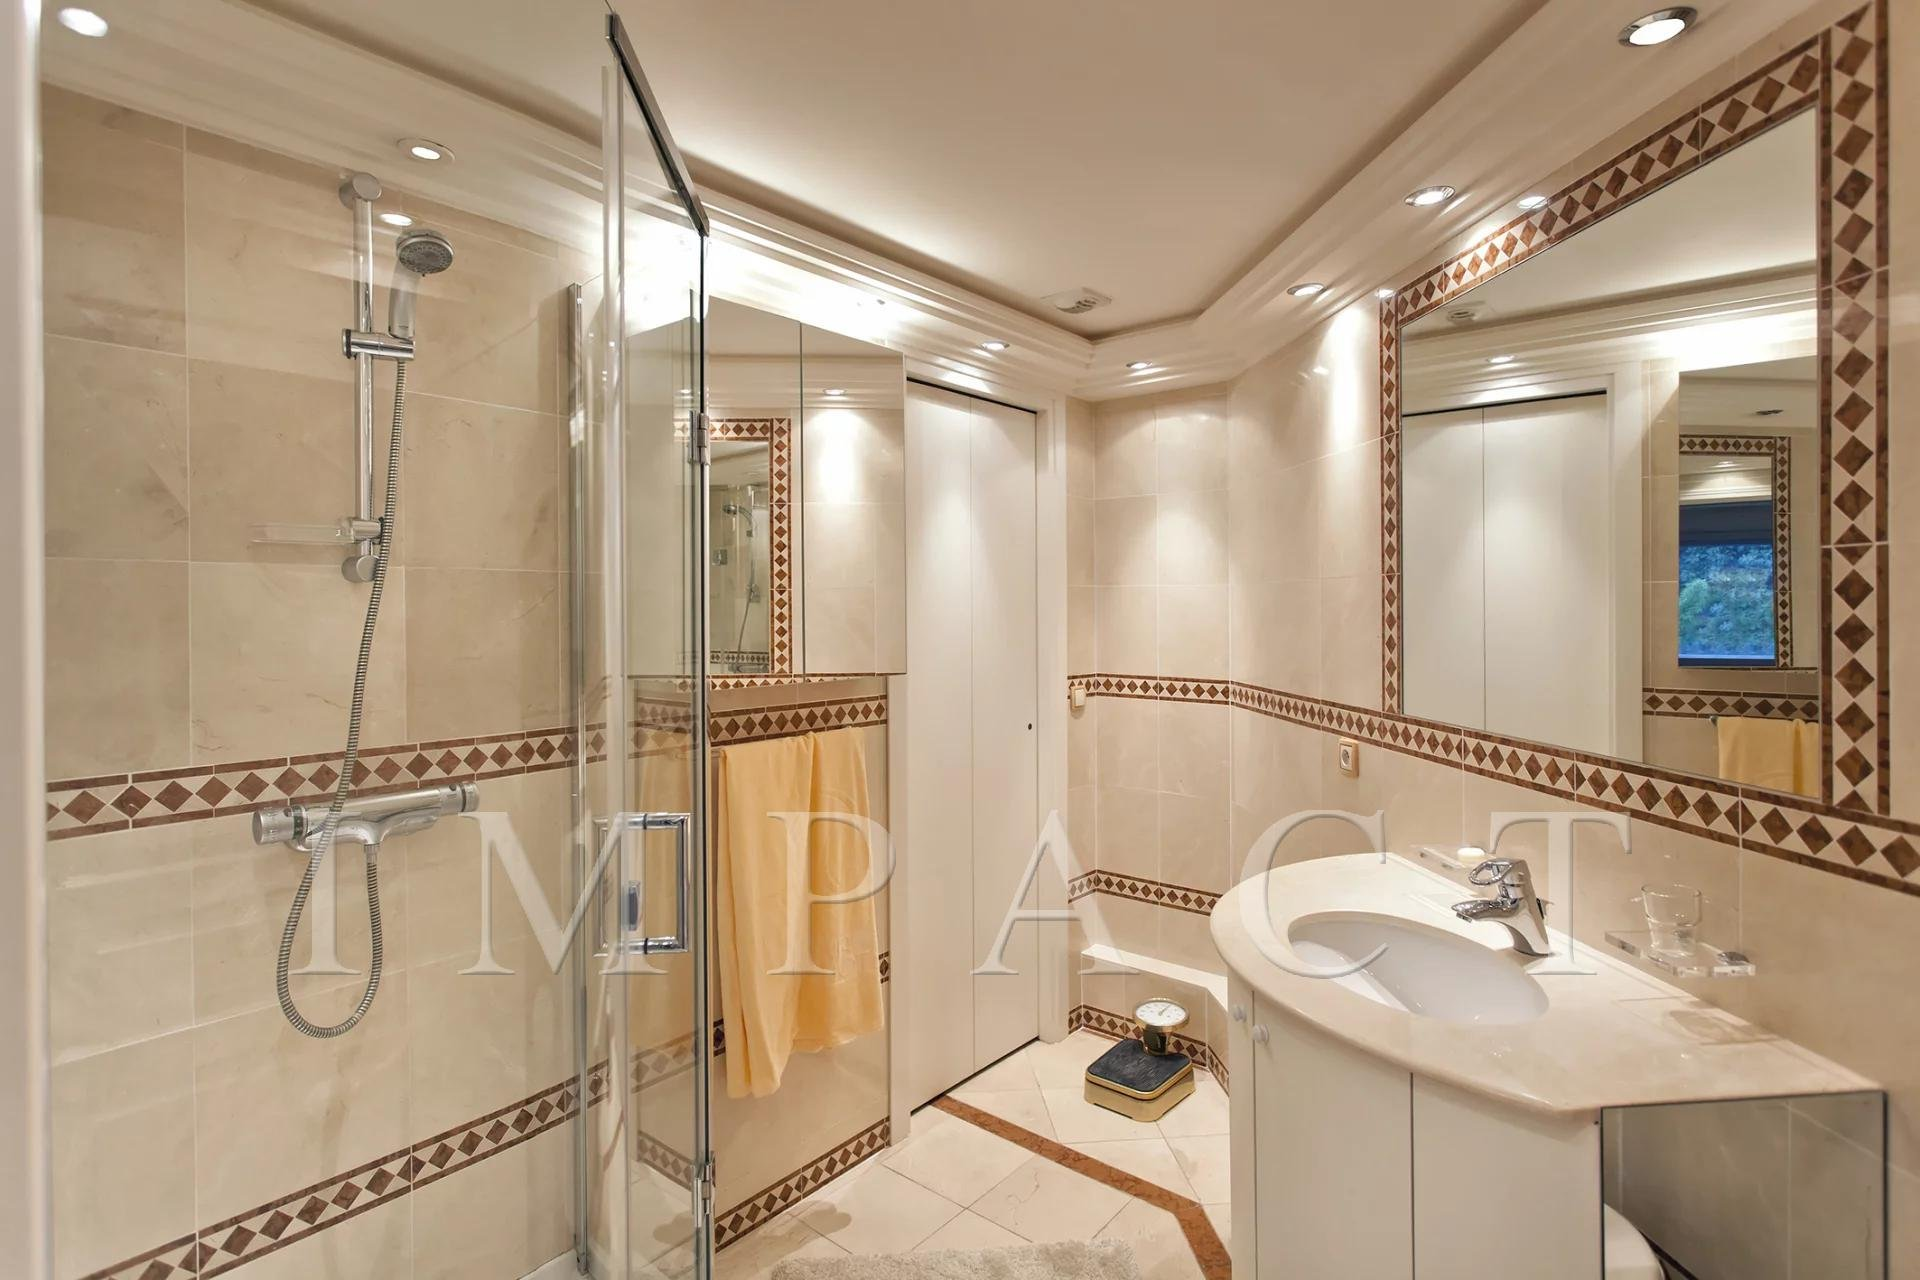 Apartment of 305m2 for sale CANNES Croisette